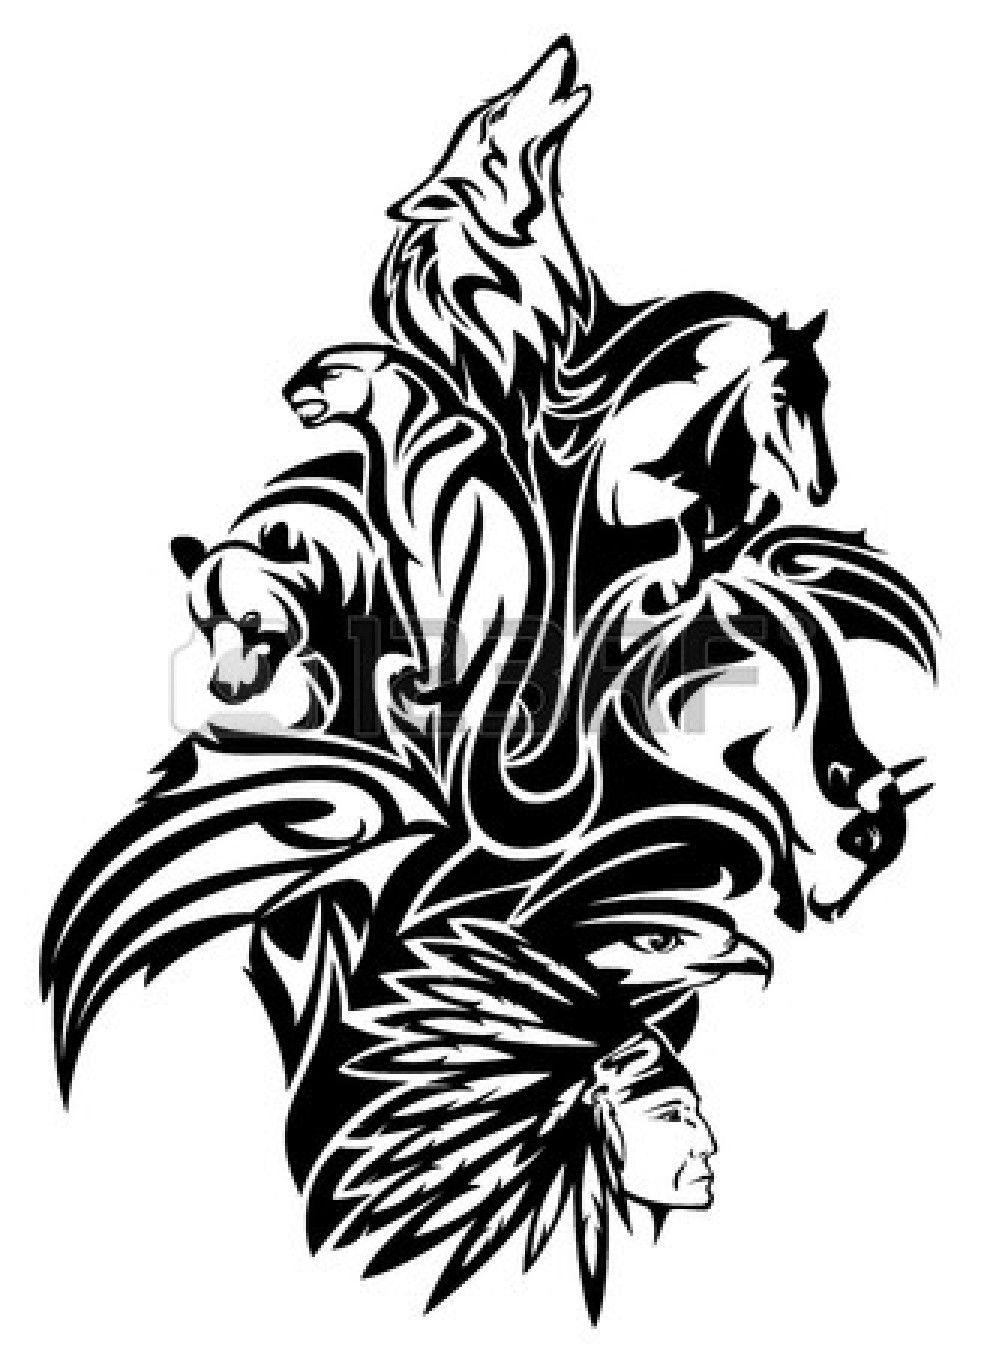 Native American Chief With Animal Spirits Design Black And Tribal Animal Tattoos Tribal Animals Animal Spirit Tattoo